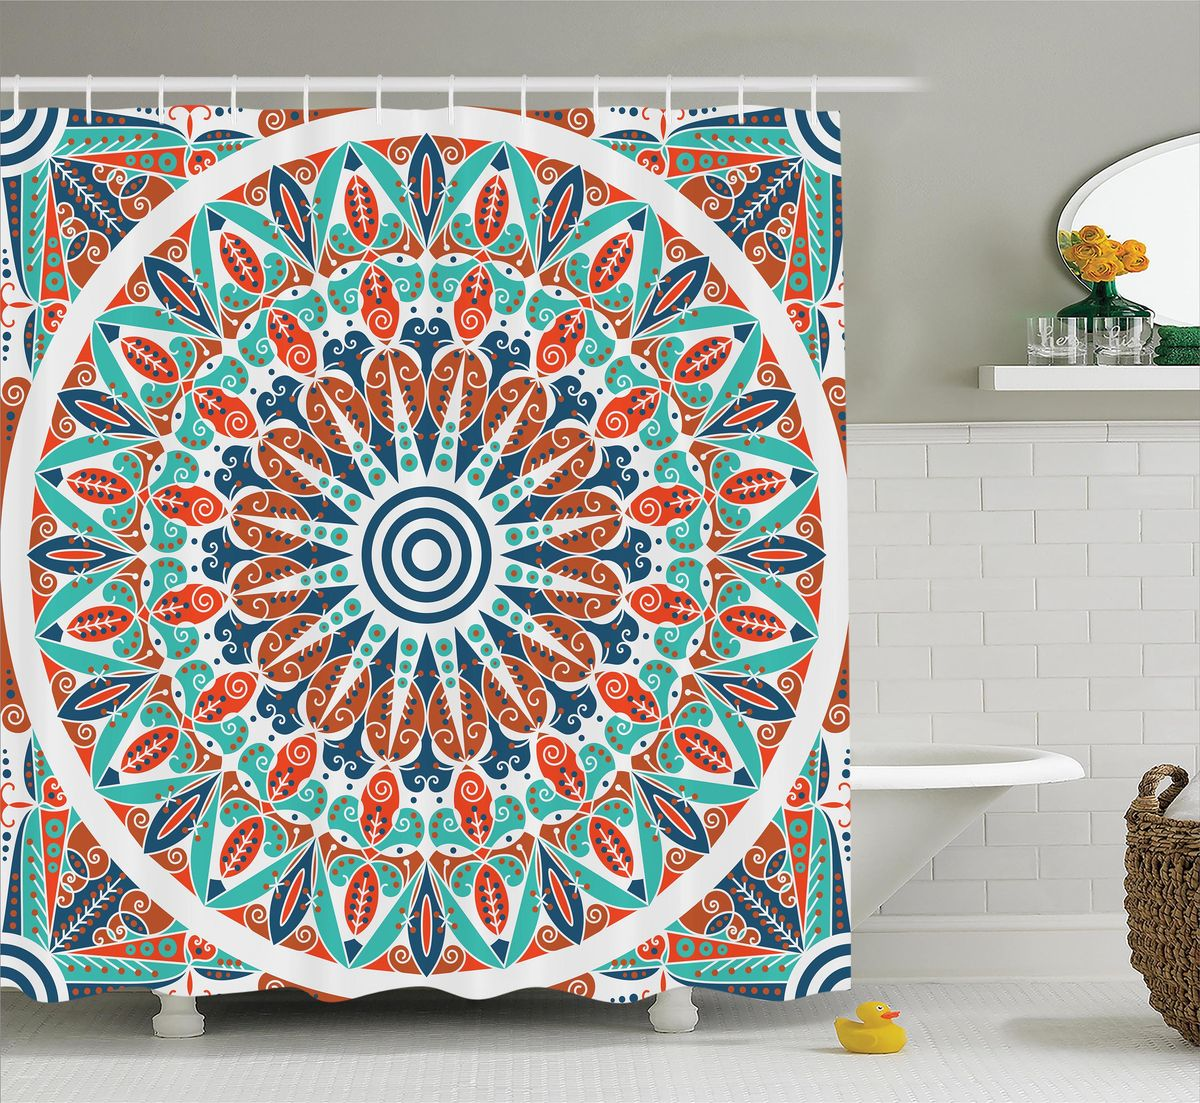 Штора для ванной комнаты Magic Lady Индийский орнамент, 180 х 200 см штора для ванной комнаты magic lady абрикос на закате весна 180 х 200 см